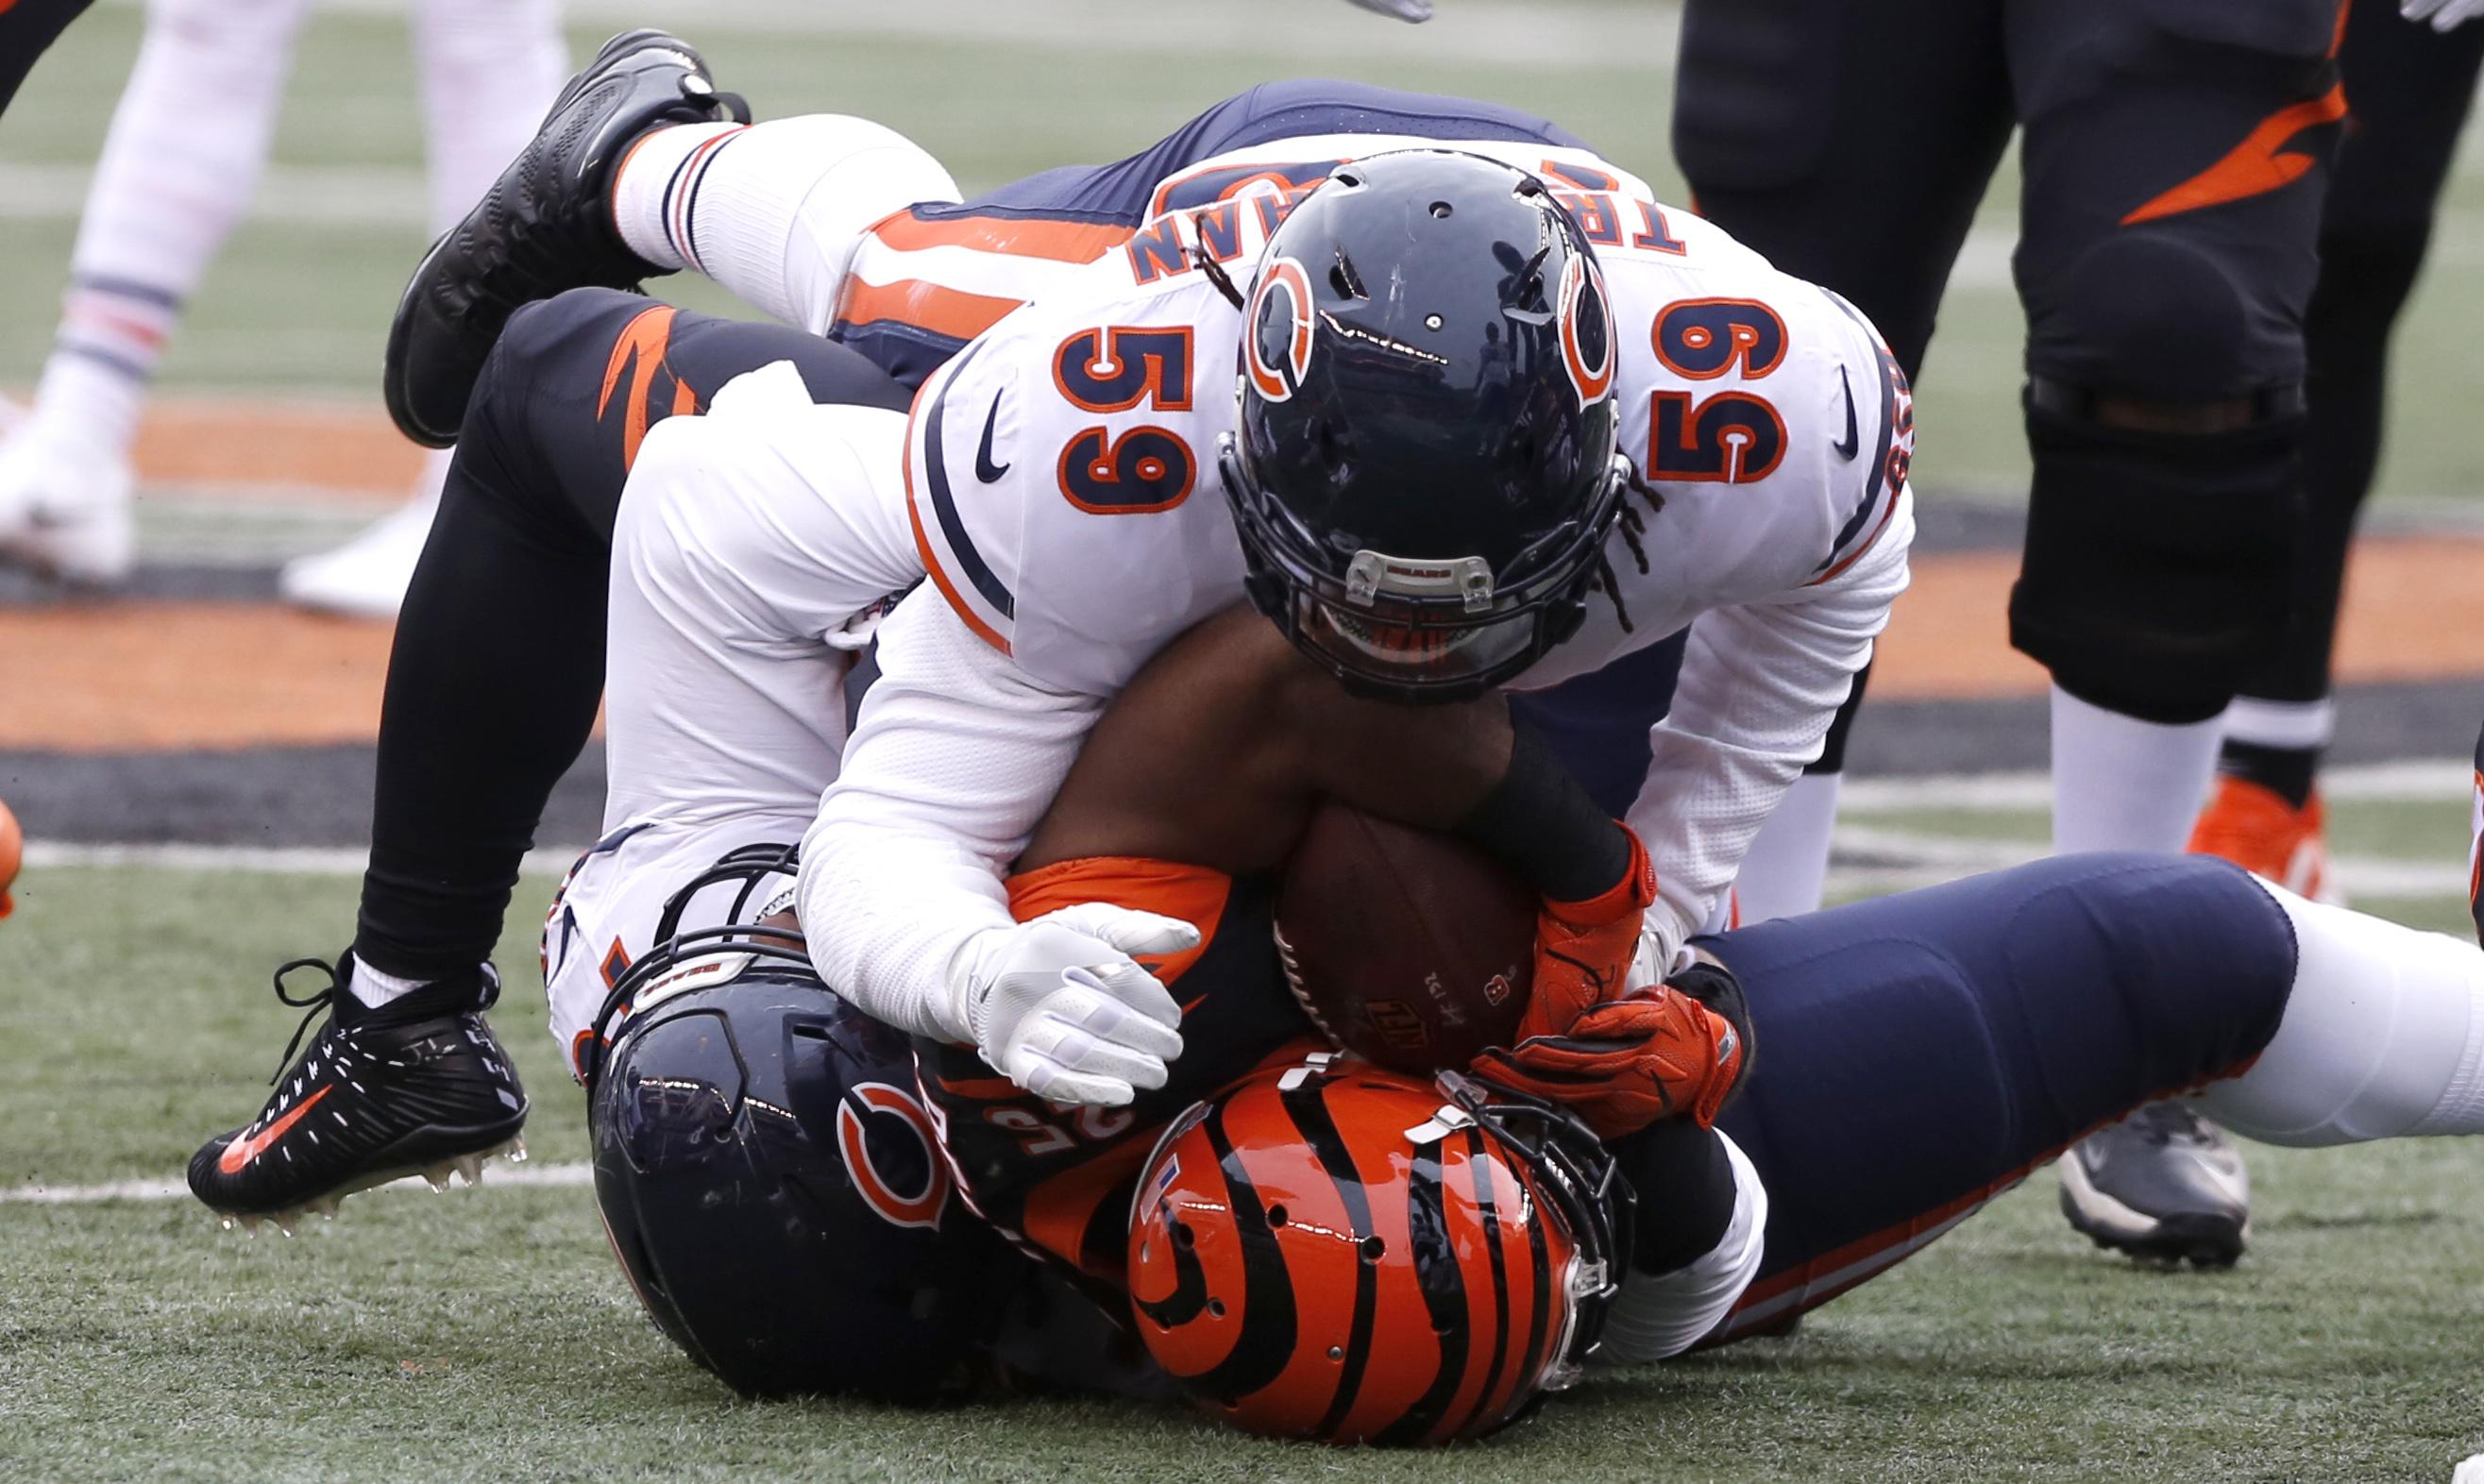 NFL: Chicago Bears at Cincinnati Bengals